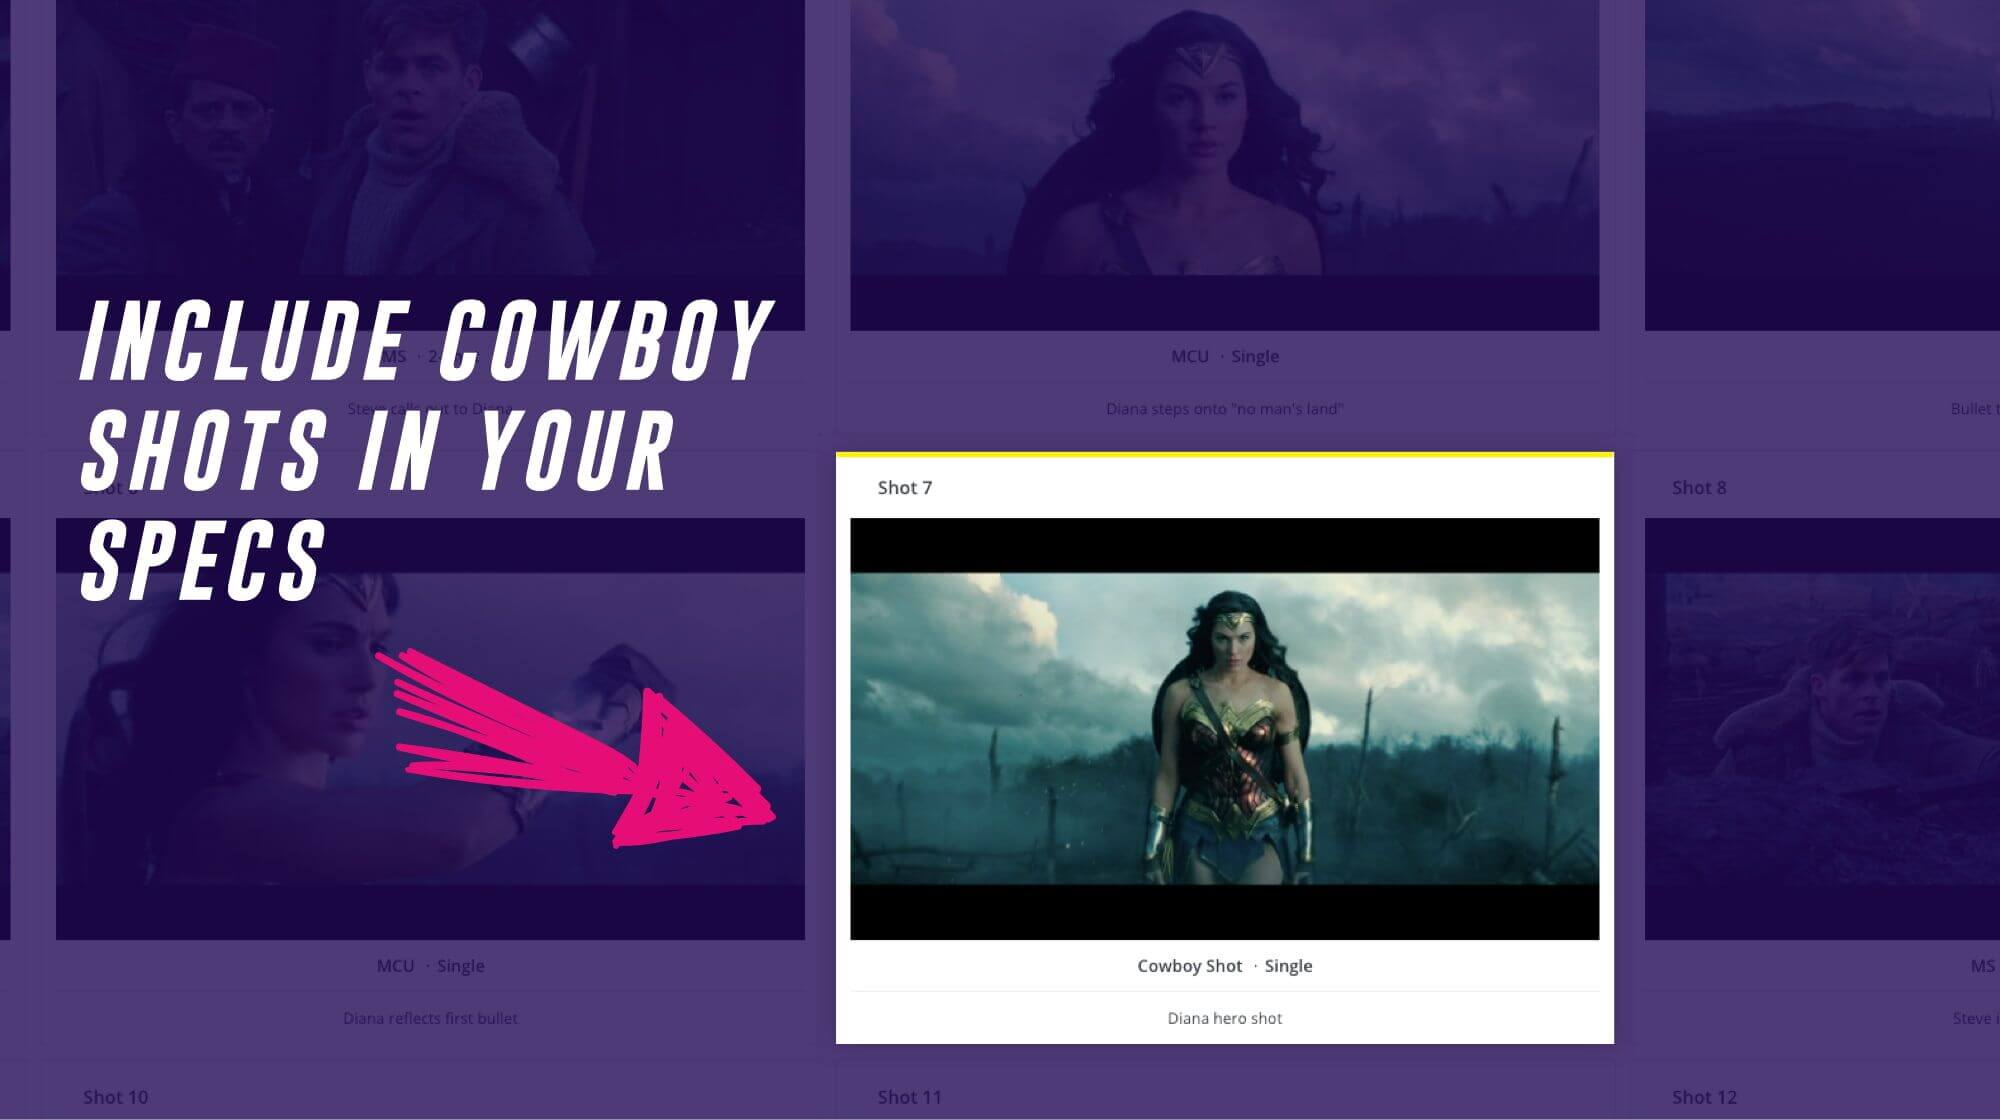 Different Types of Shots Cowboy Shot Wonder Woman Shot List StudioBinder